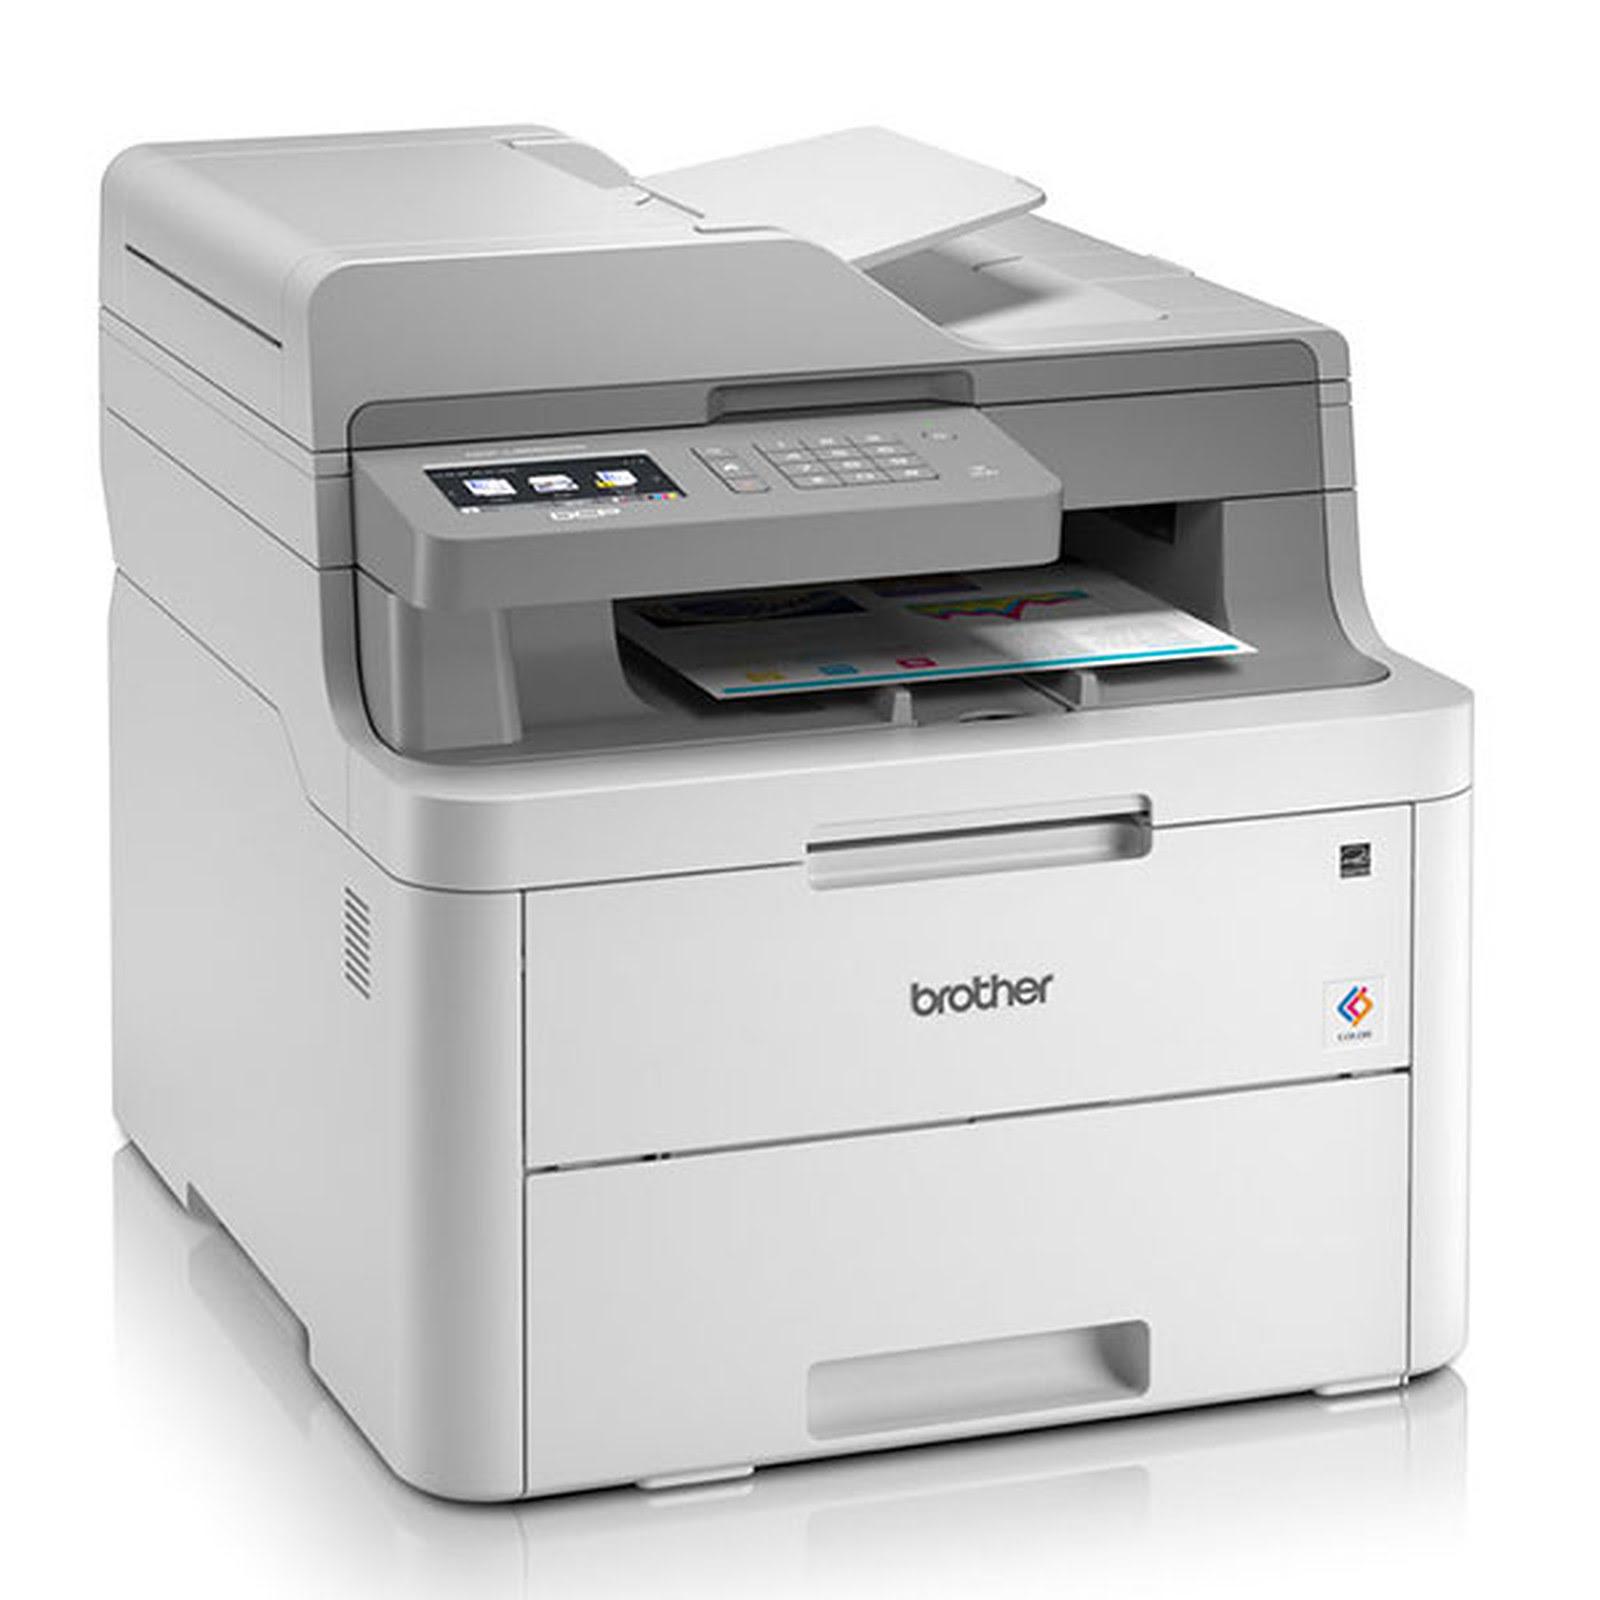 Imprimante multifonction Brother DCP-L3550CDW - Cybertek.fr - 2